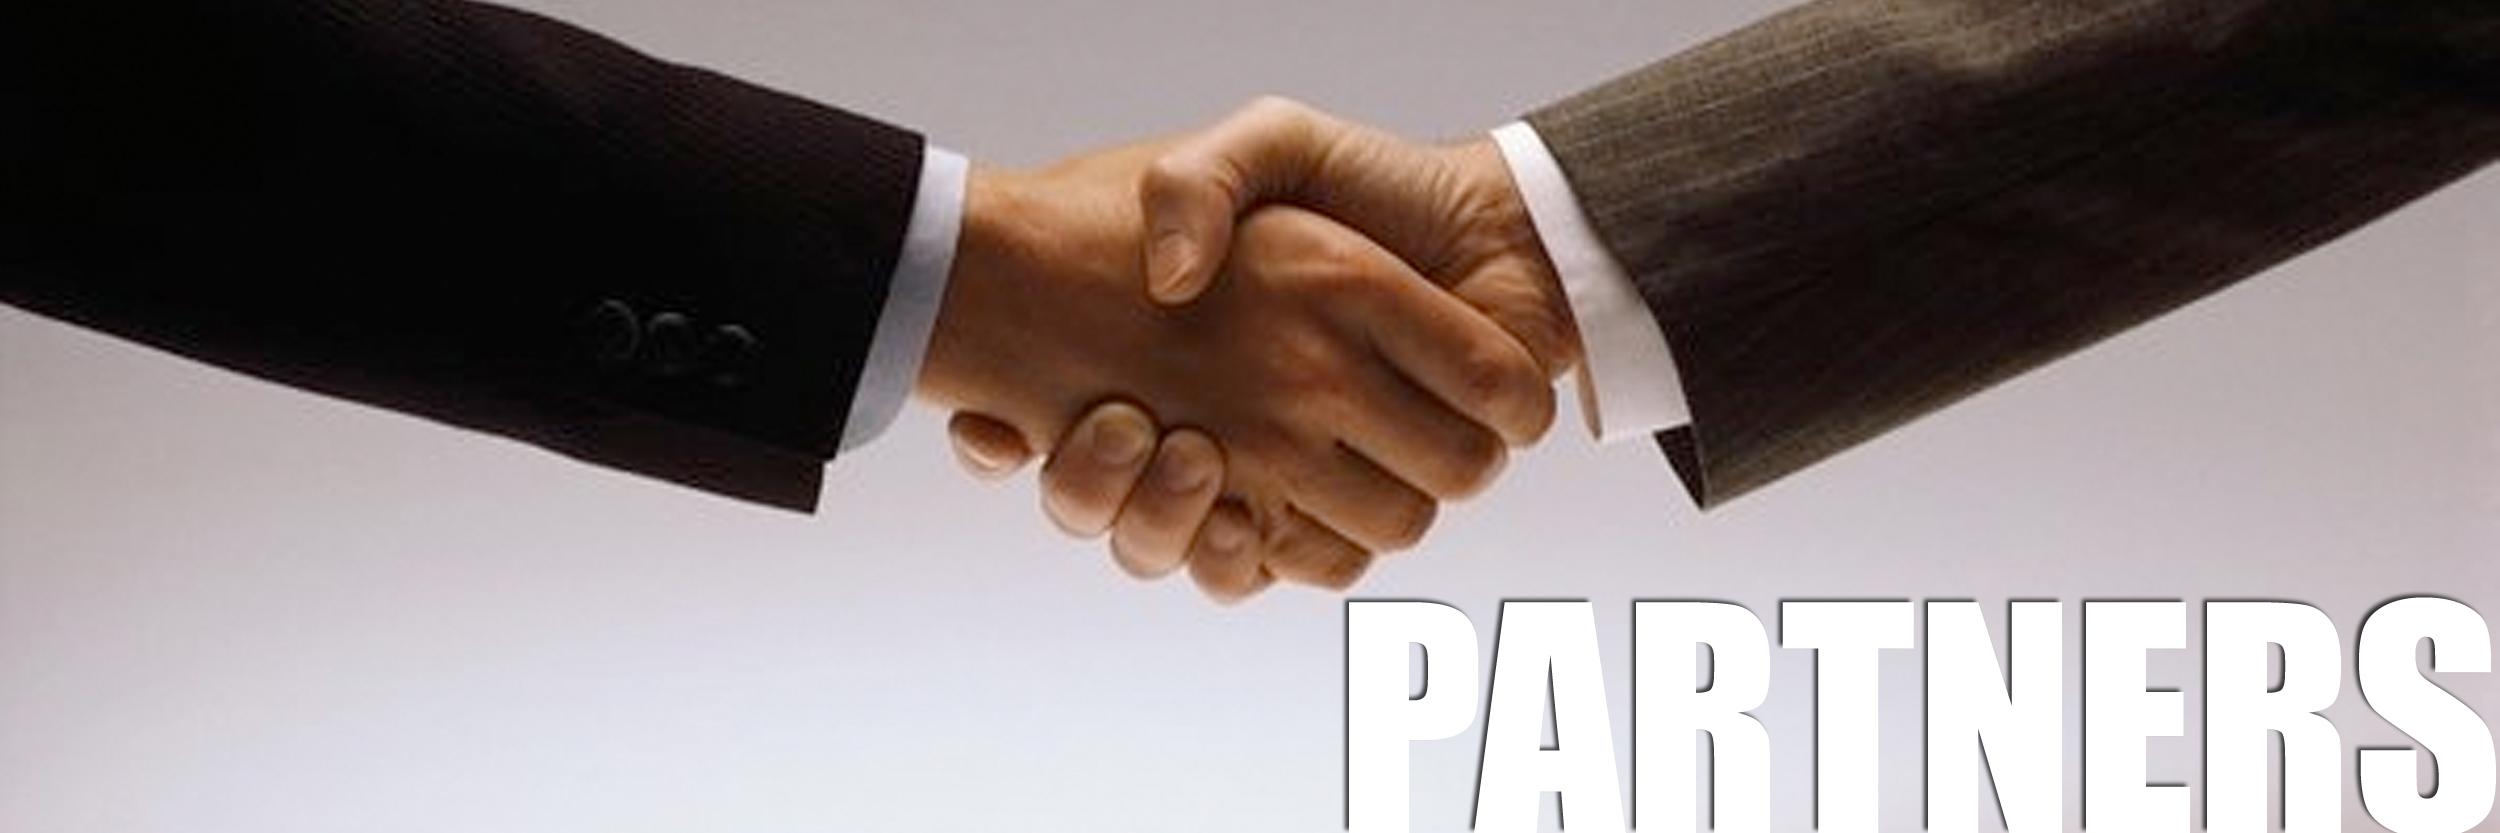 Vpartners